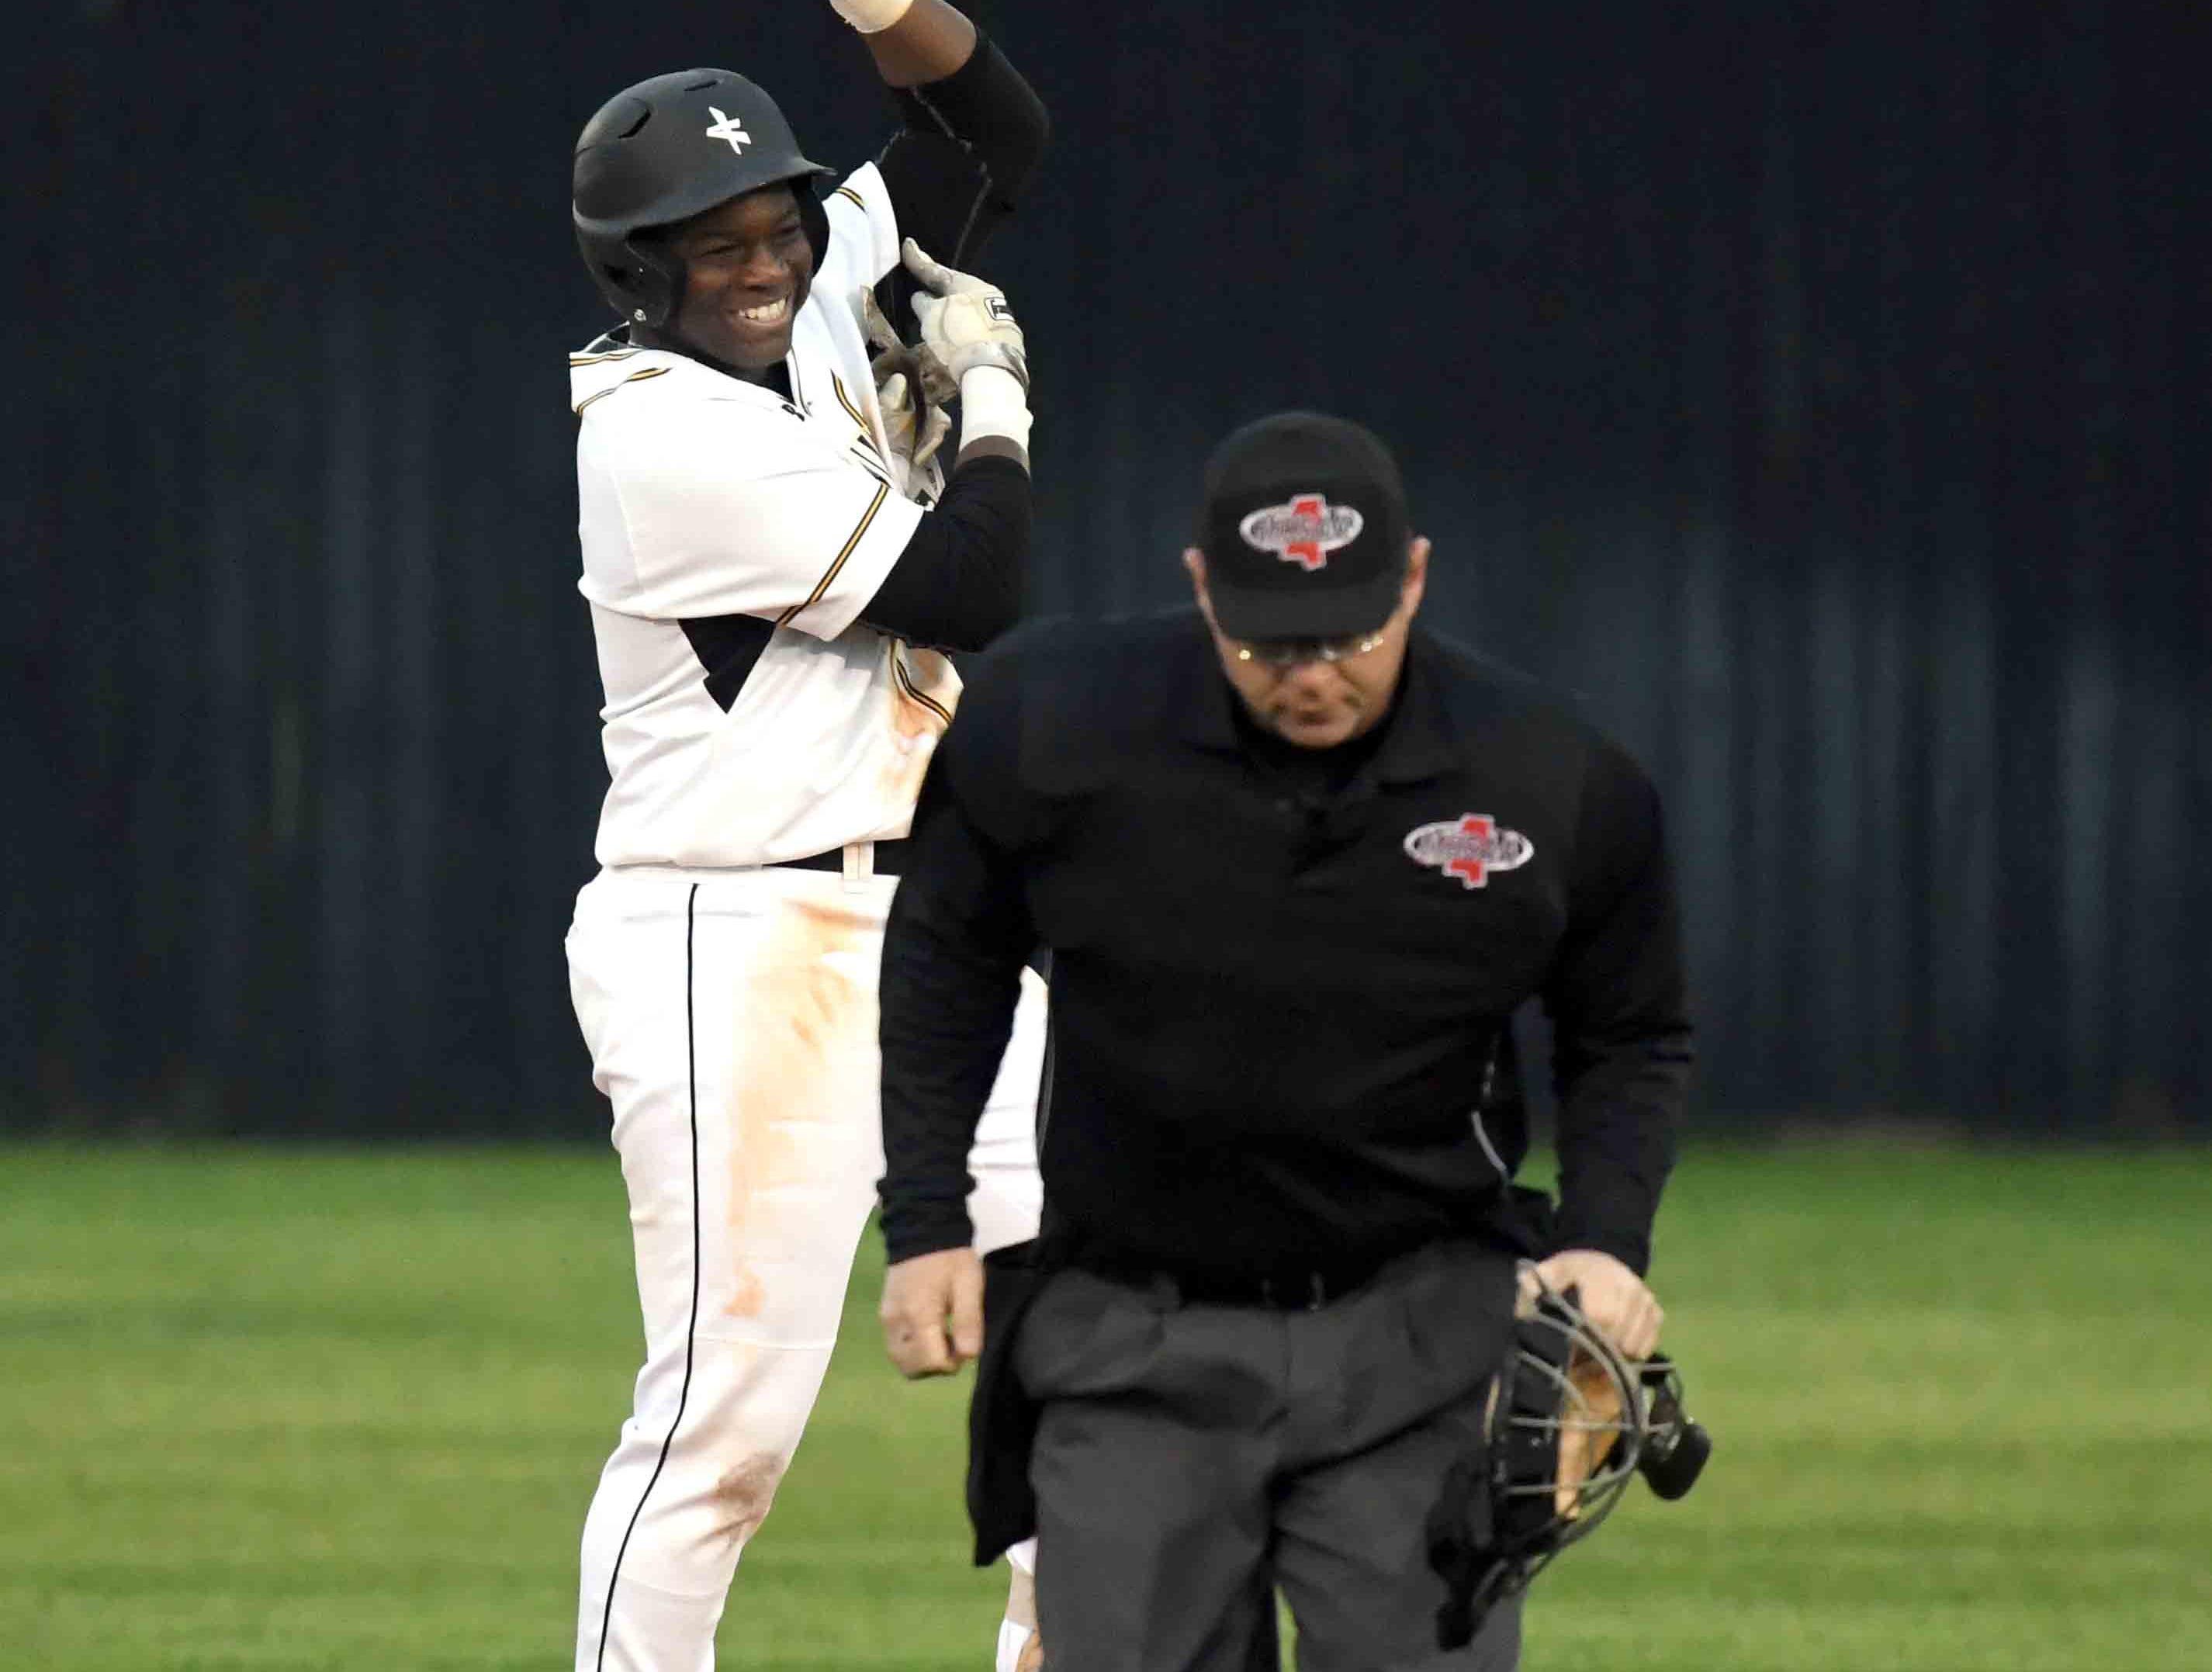 Oak Grove senior Alex Bolling celebrates on second base in their season opener against Seminary in Hattiesburg on Monday, February 18, 2019.